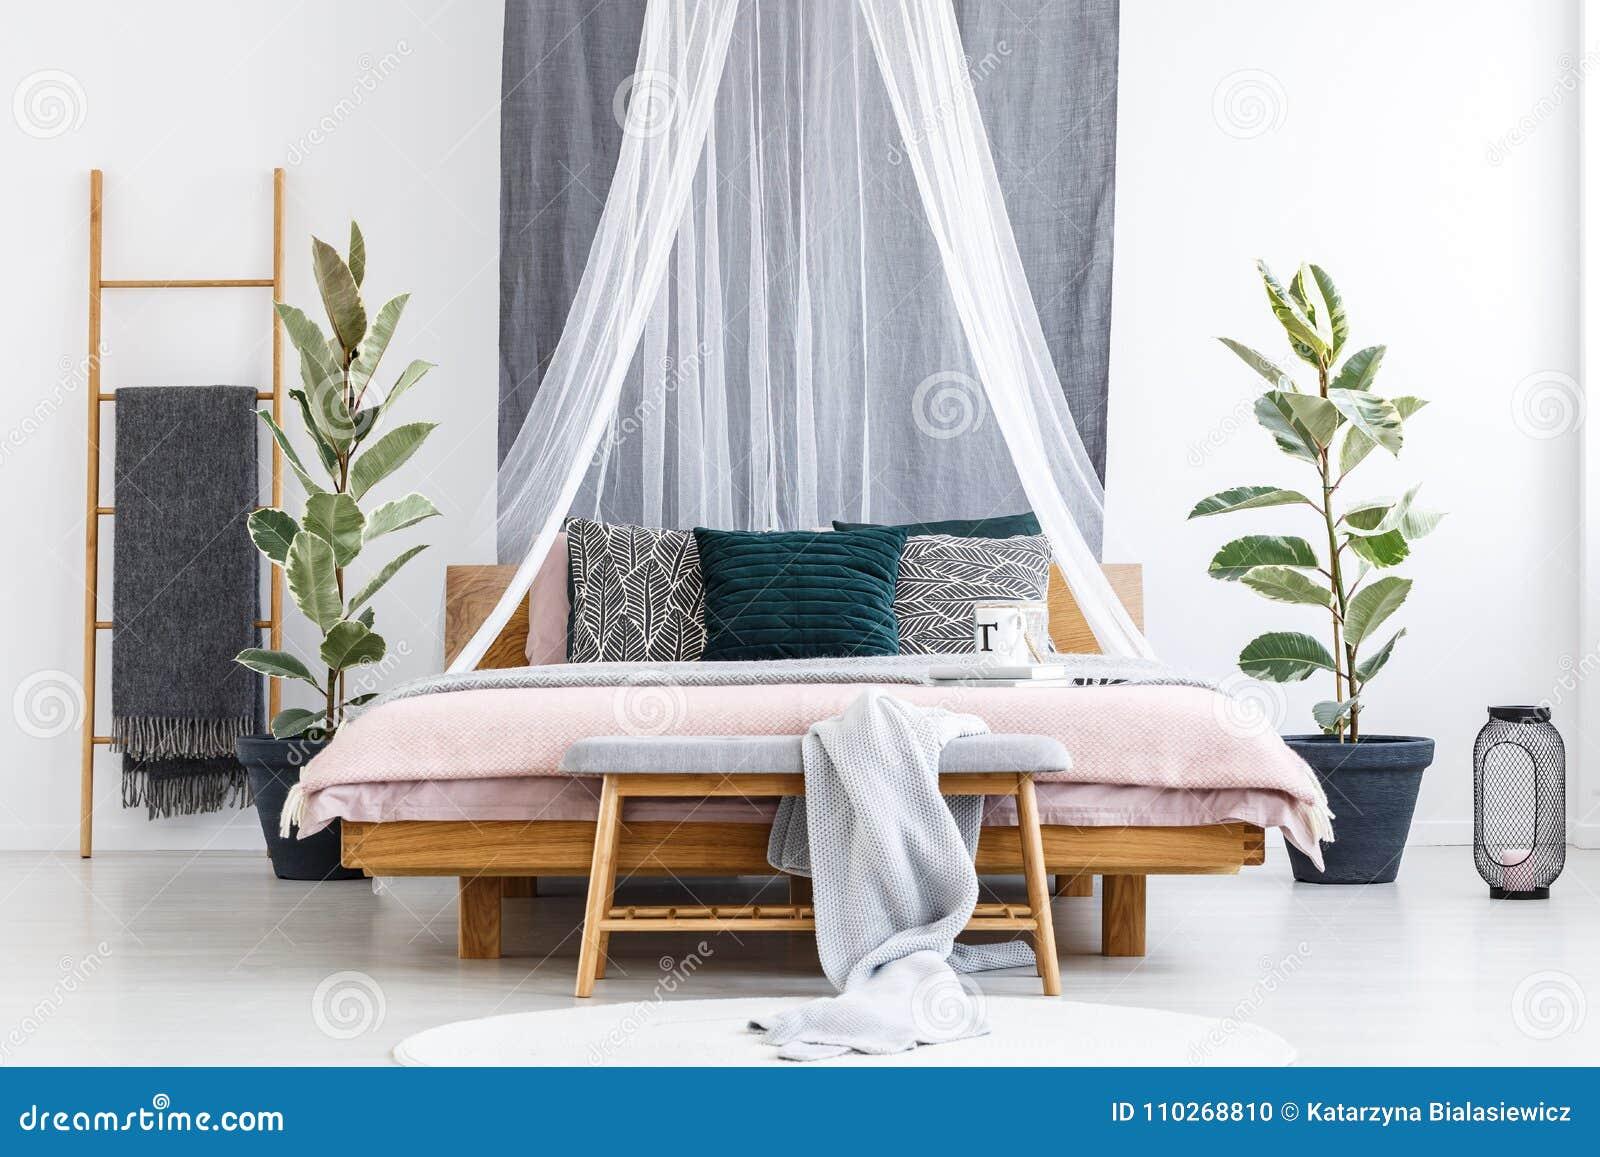 romantic bedroom interior main bedroom romantic bedroom interior with plants bedroom interior with plants stock photo image of